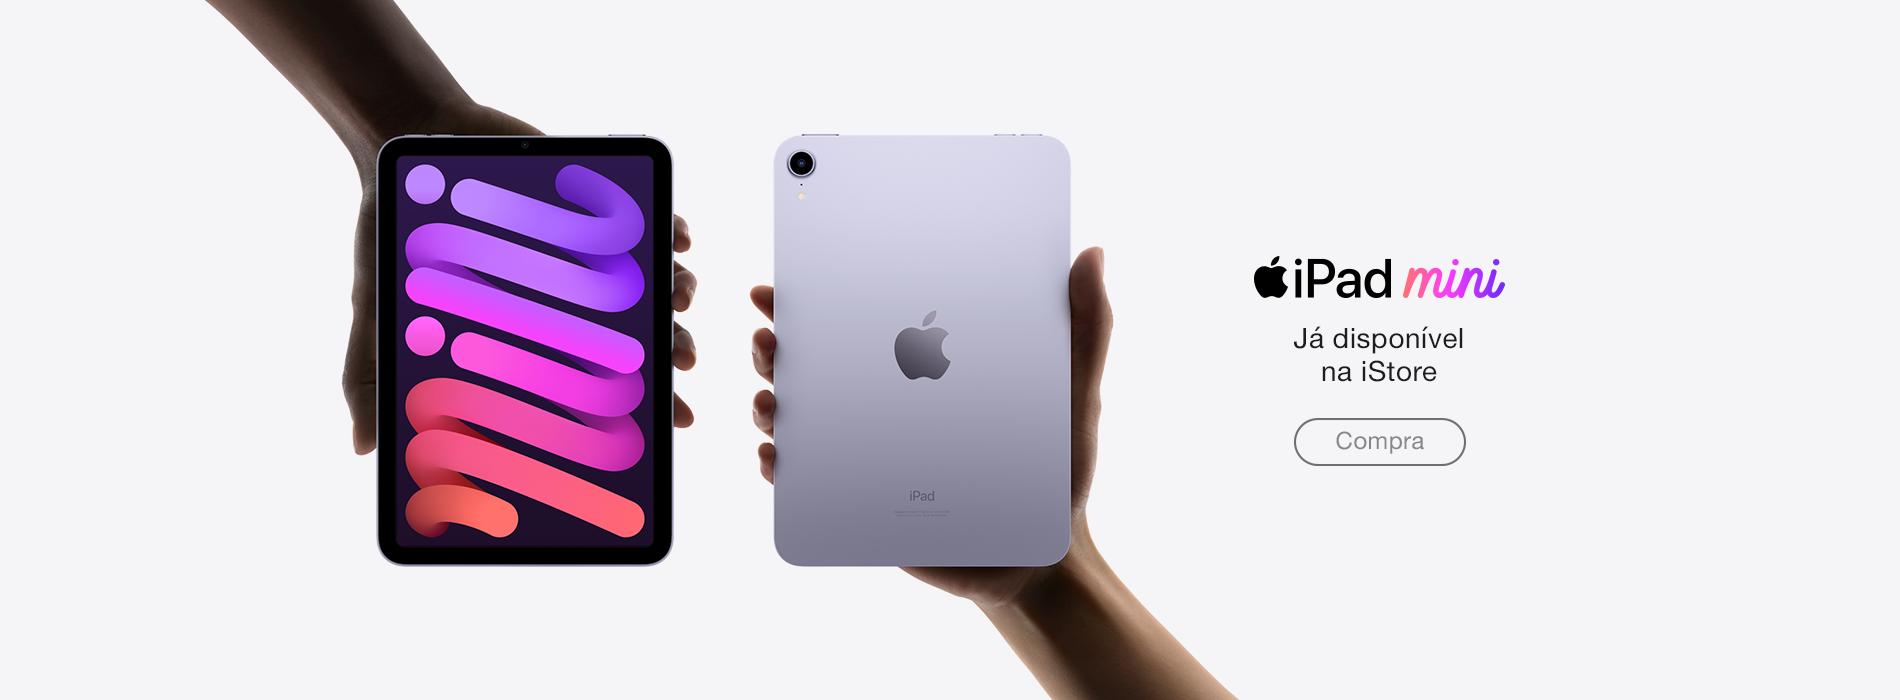 NPI - Disponível - iPad mini